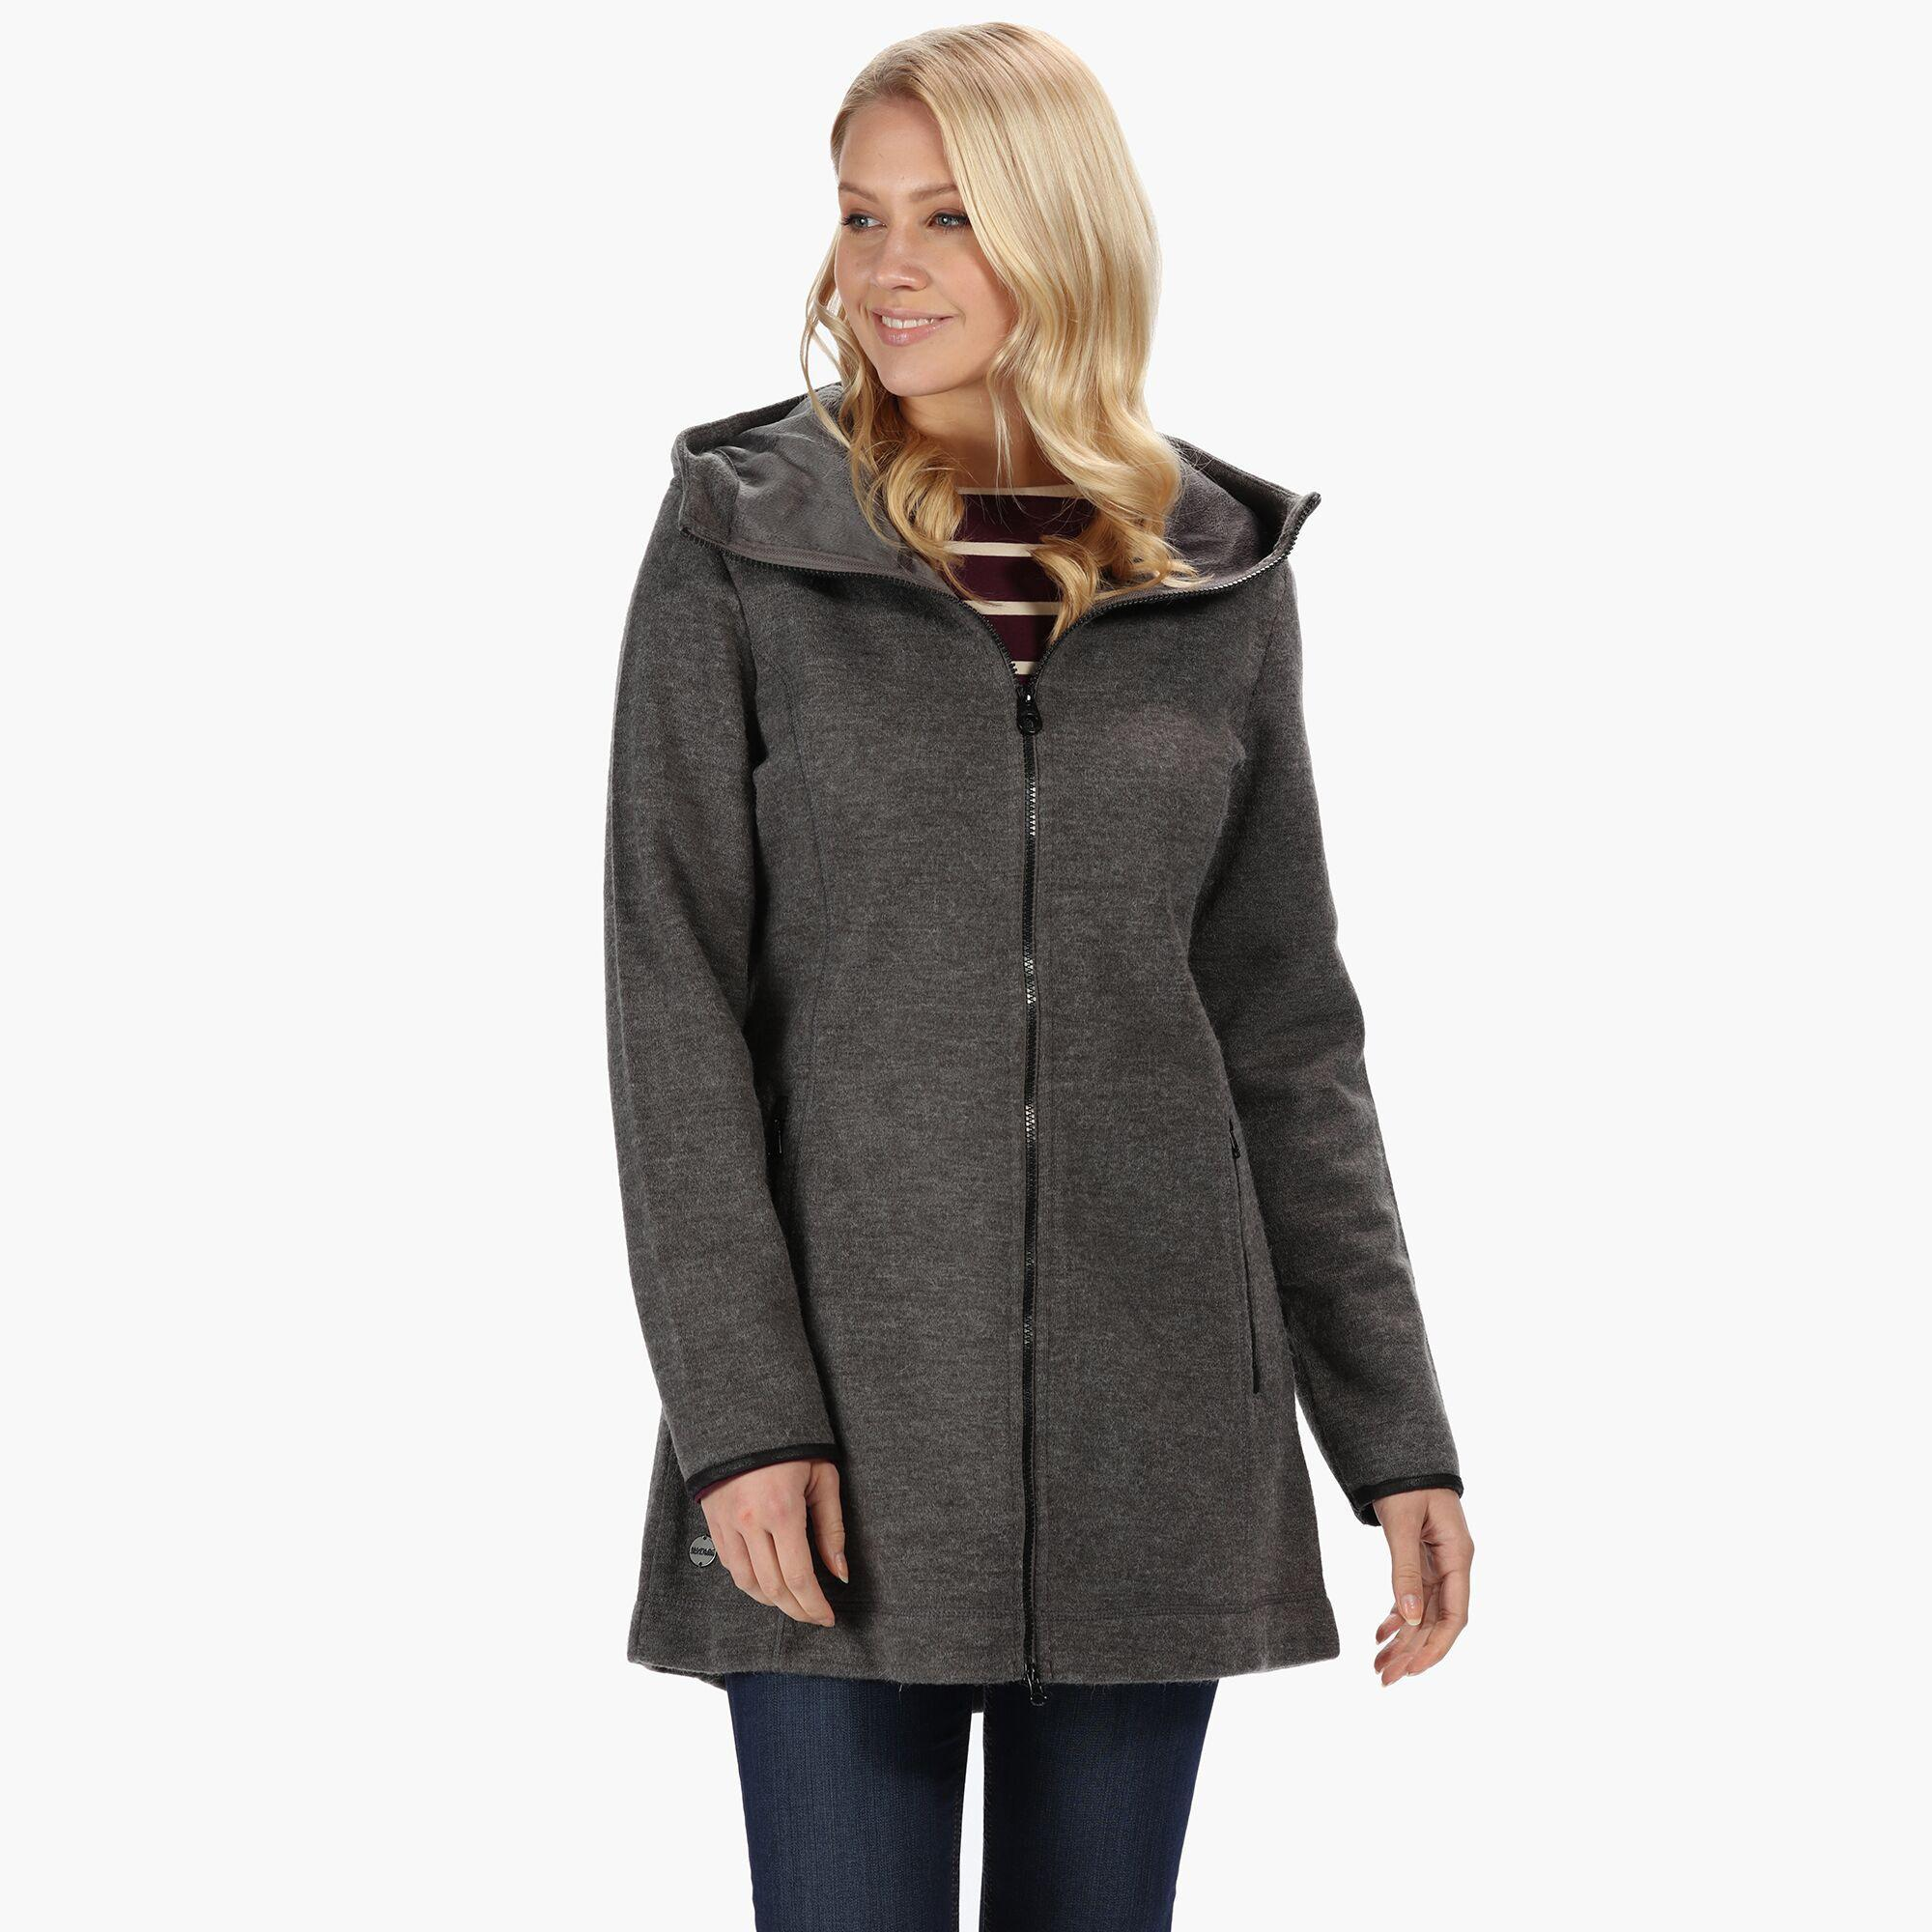 Regatta Seymore III Womens Technical Hooded Zip Through Fleece Jacket